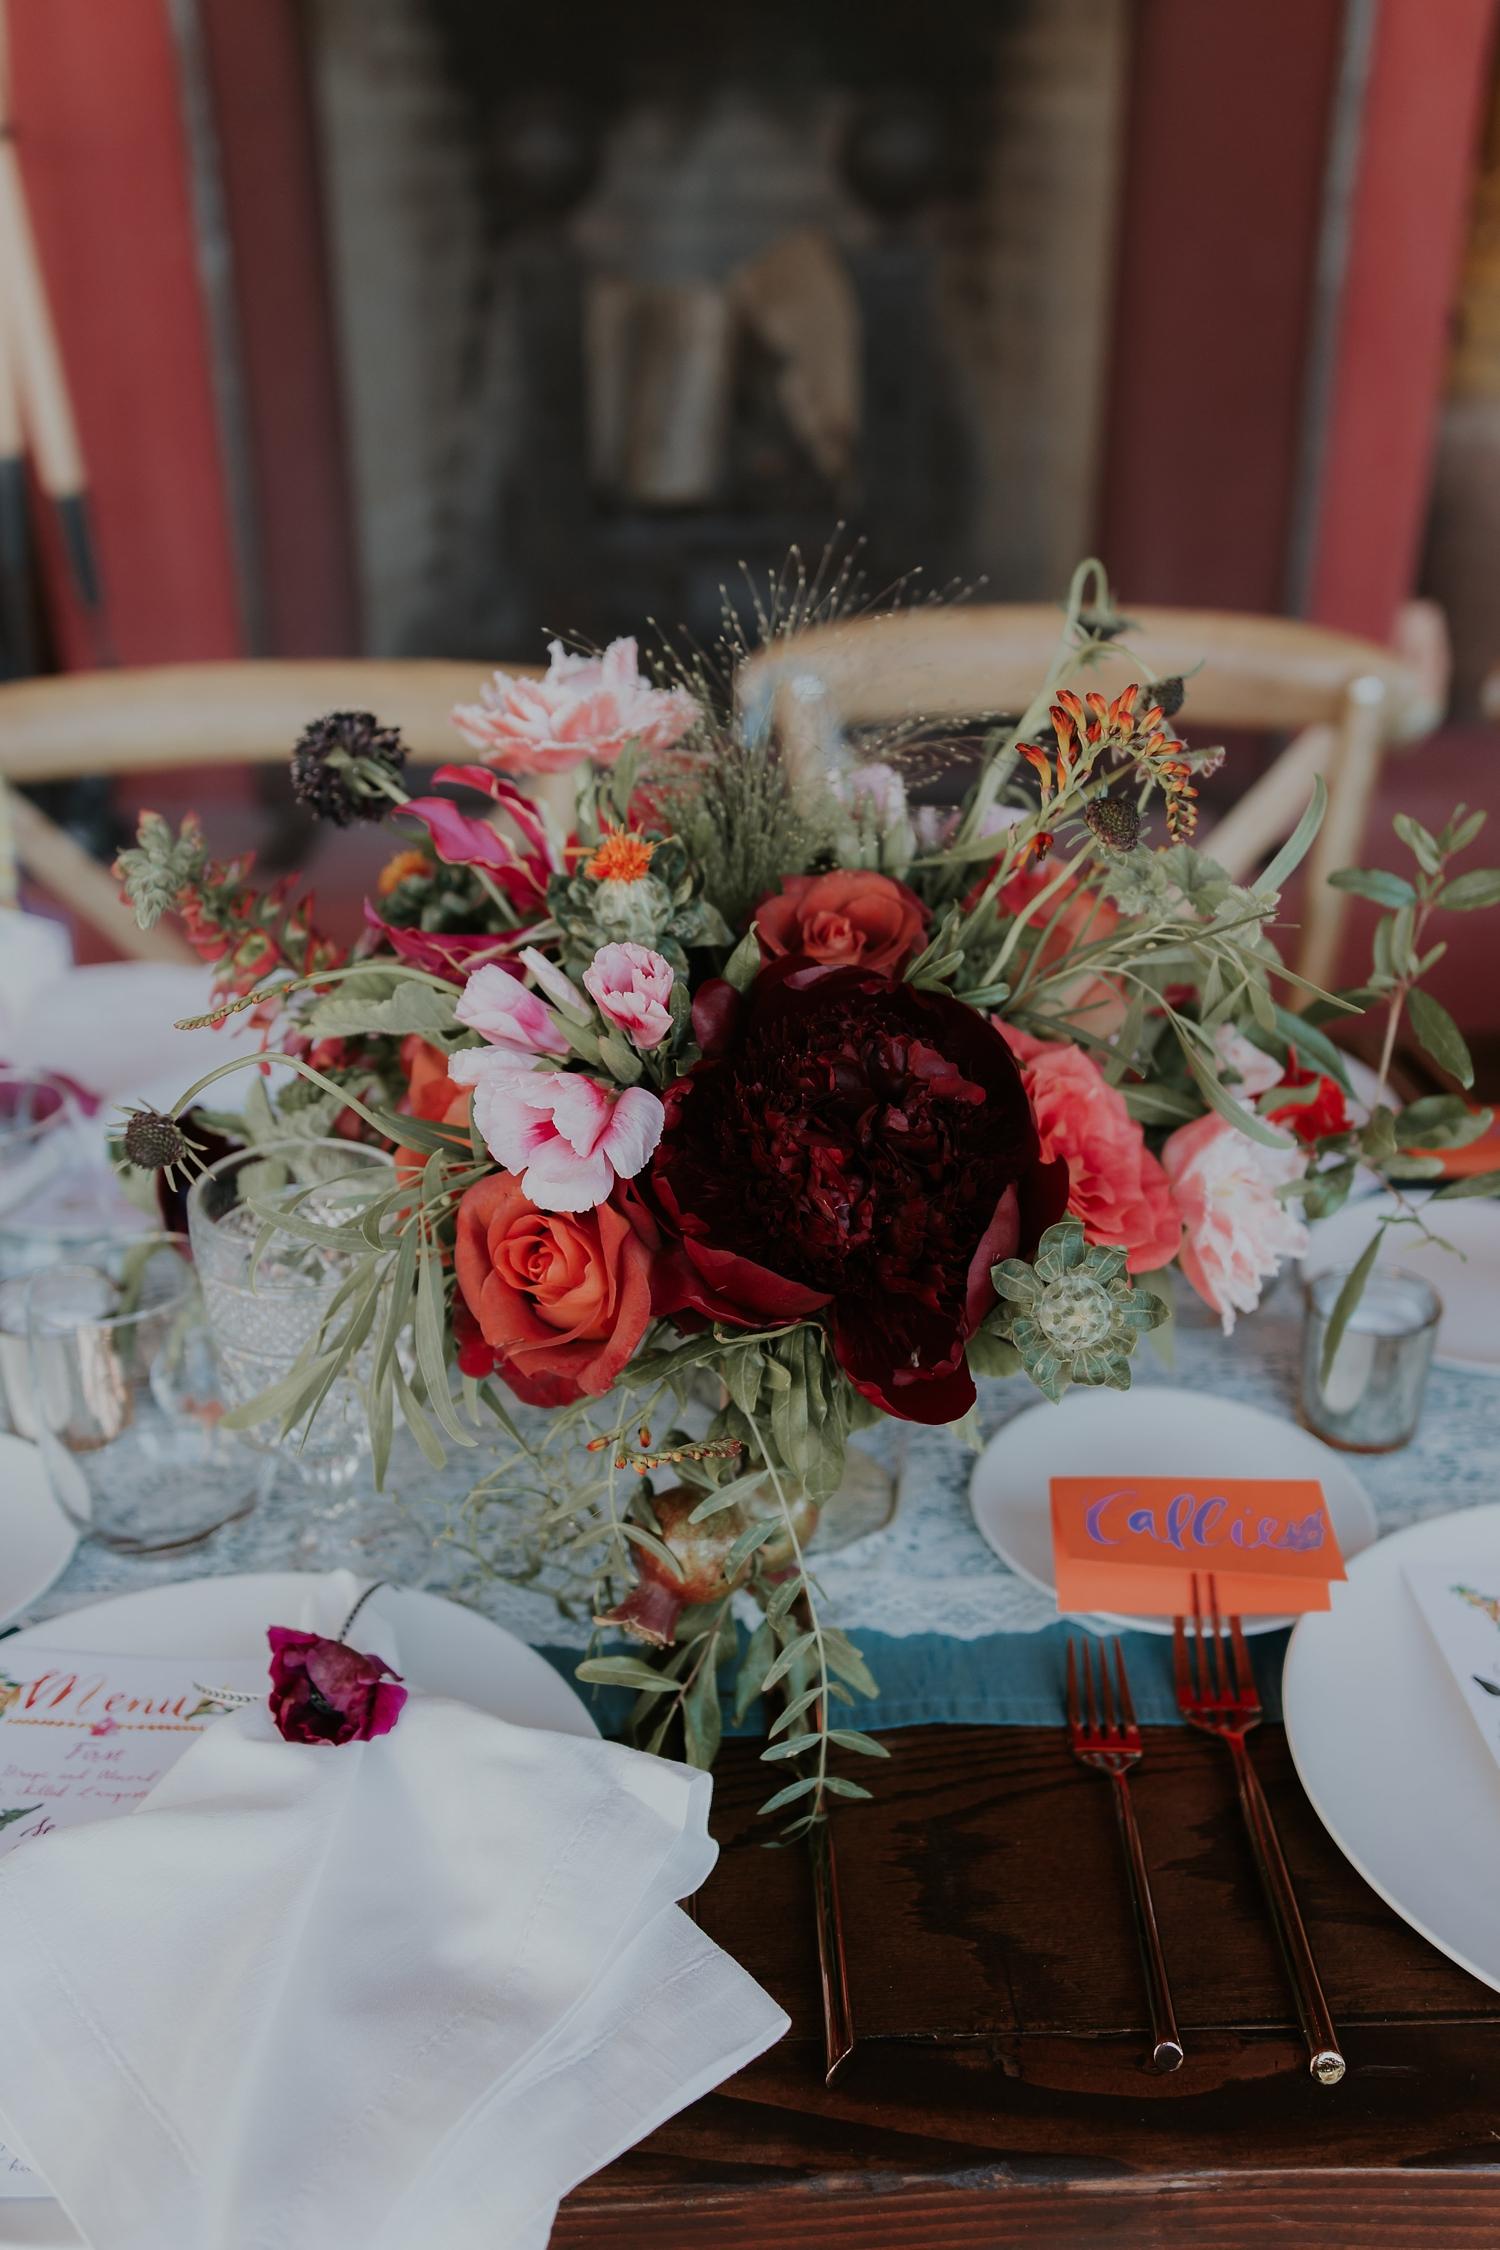 Alicia+lucia+photography+-+albuquerque+wedding+photographer+-+santa+fe+wedding+photography+-+new+mexico+wedding+photographer+-+wedding+flowers+-+summer+wedding+flowers_0041.jpg